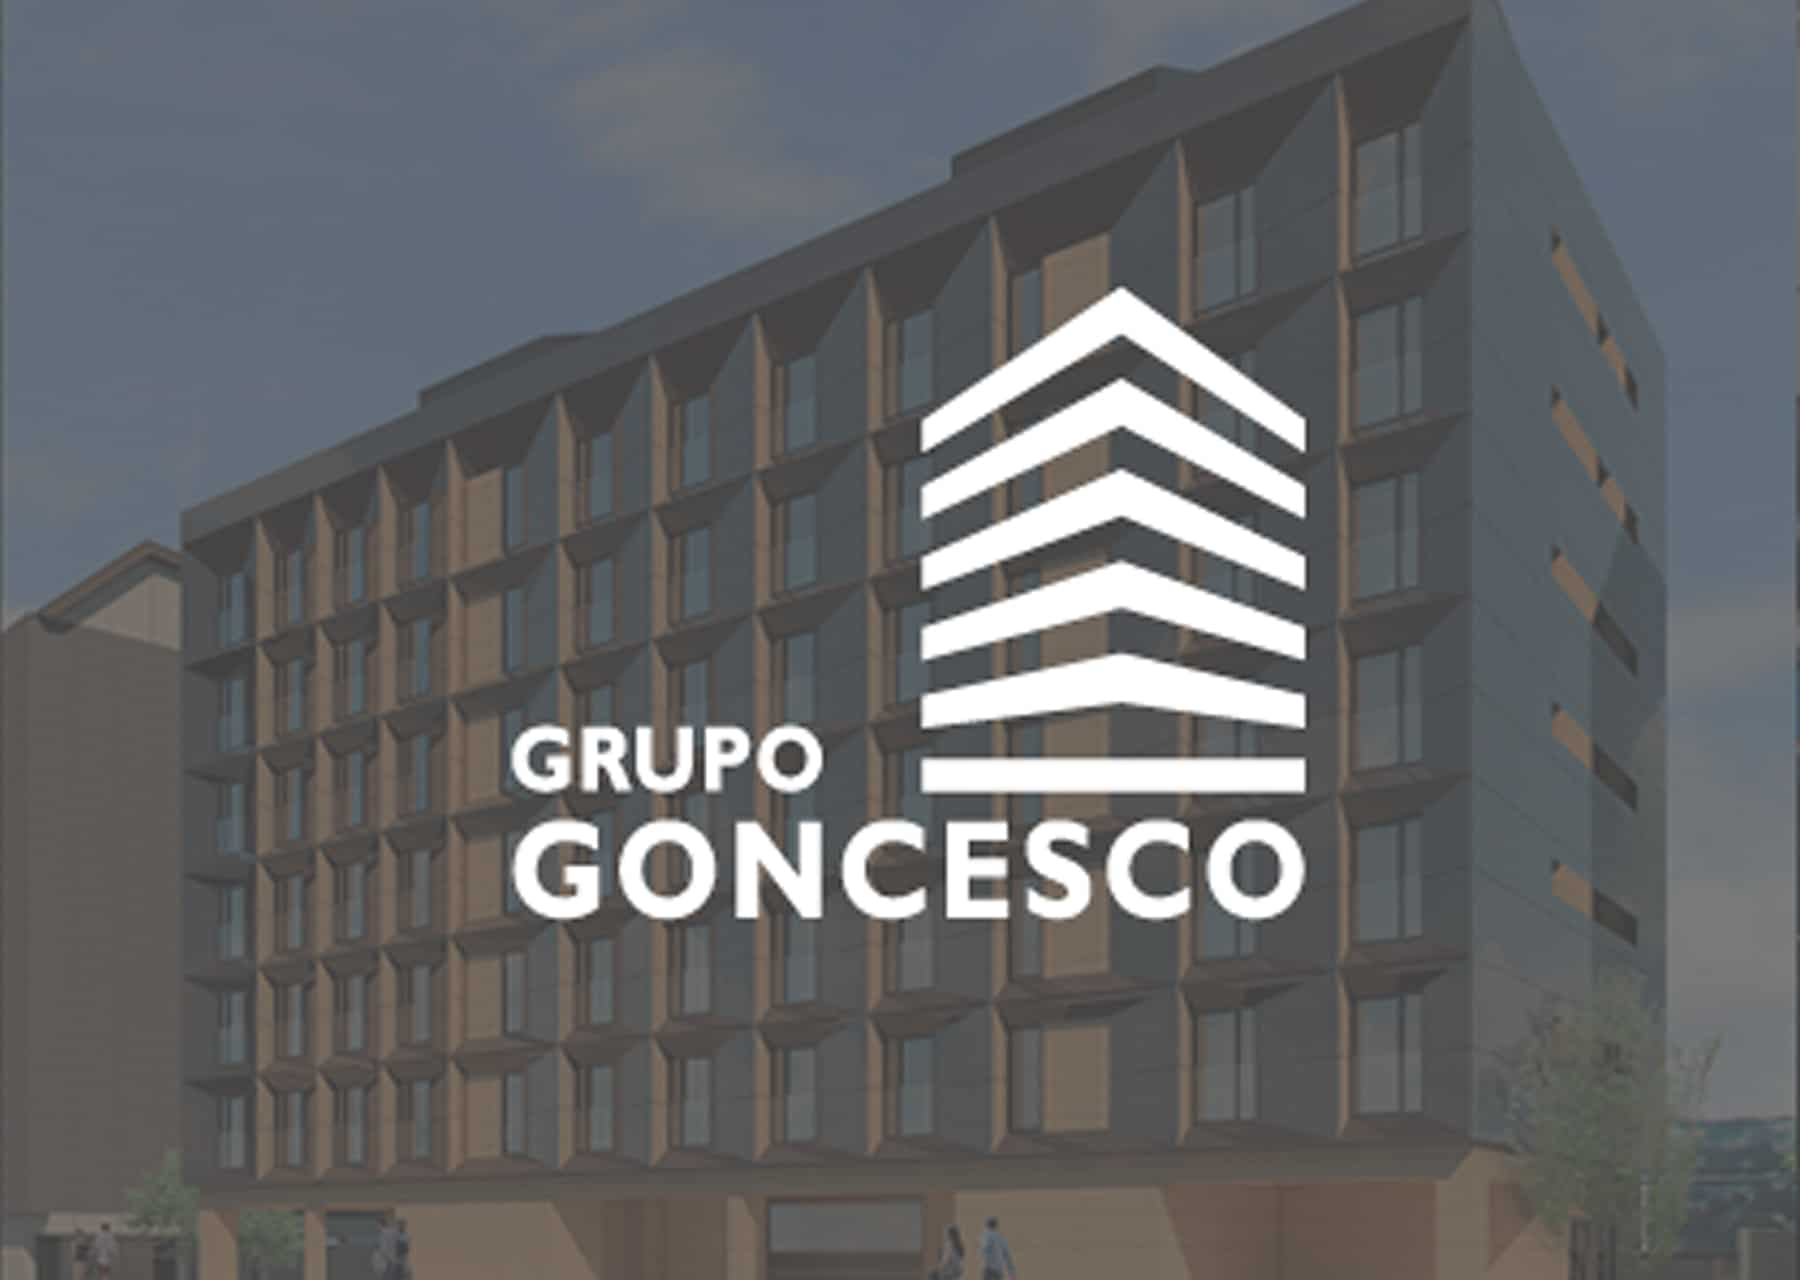 GONCESCO cliente de dvproject construccion y promocion